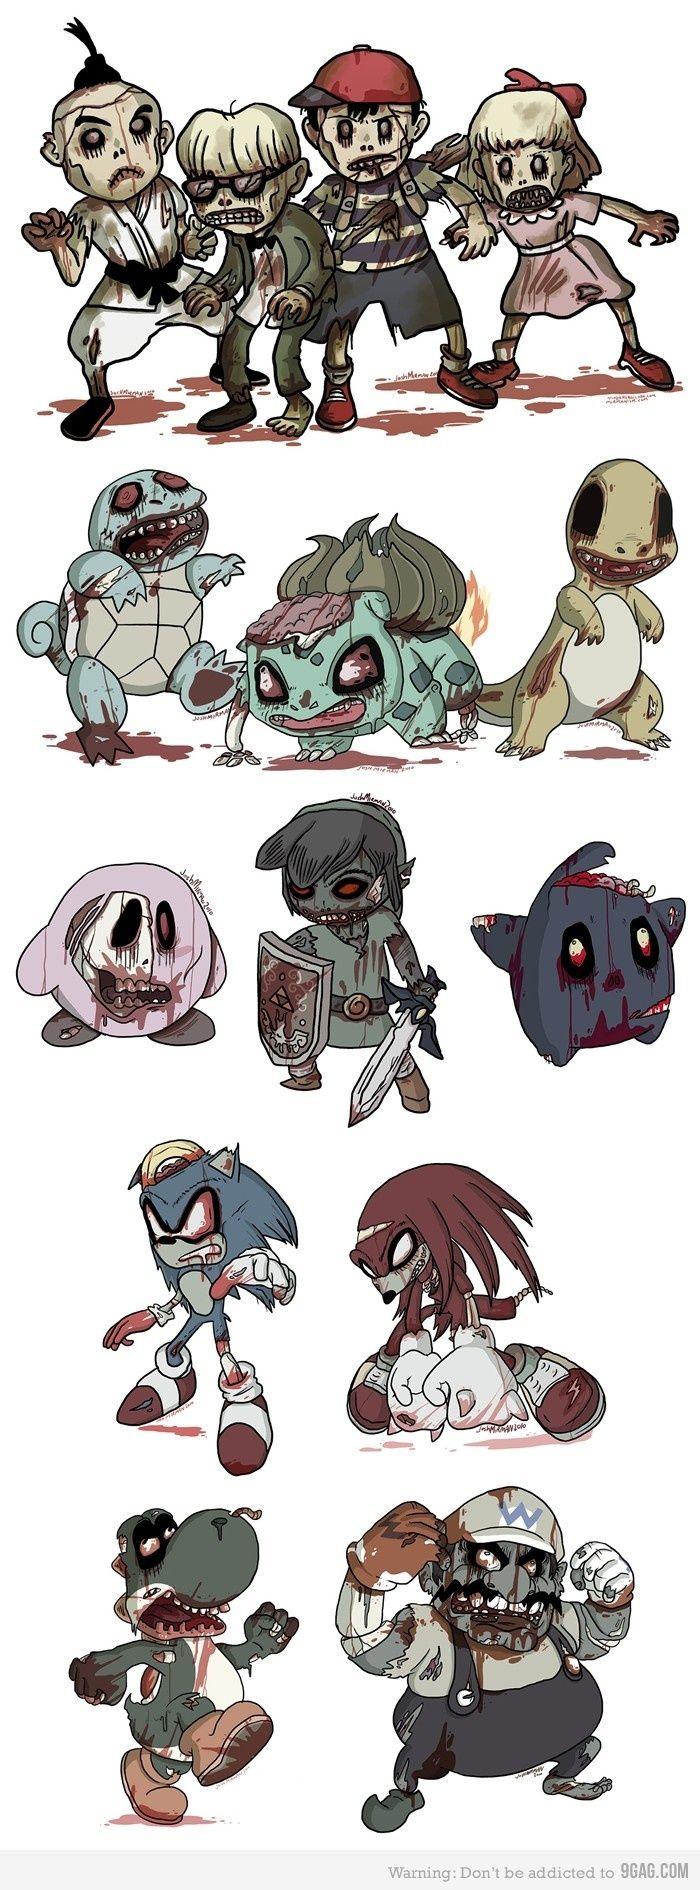 pokemon-sonic-zelda-kirby-link-mario-wario-yoshi-knuckles-charmander-bulbasaur-squirtle zombies